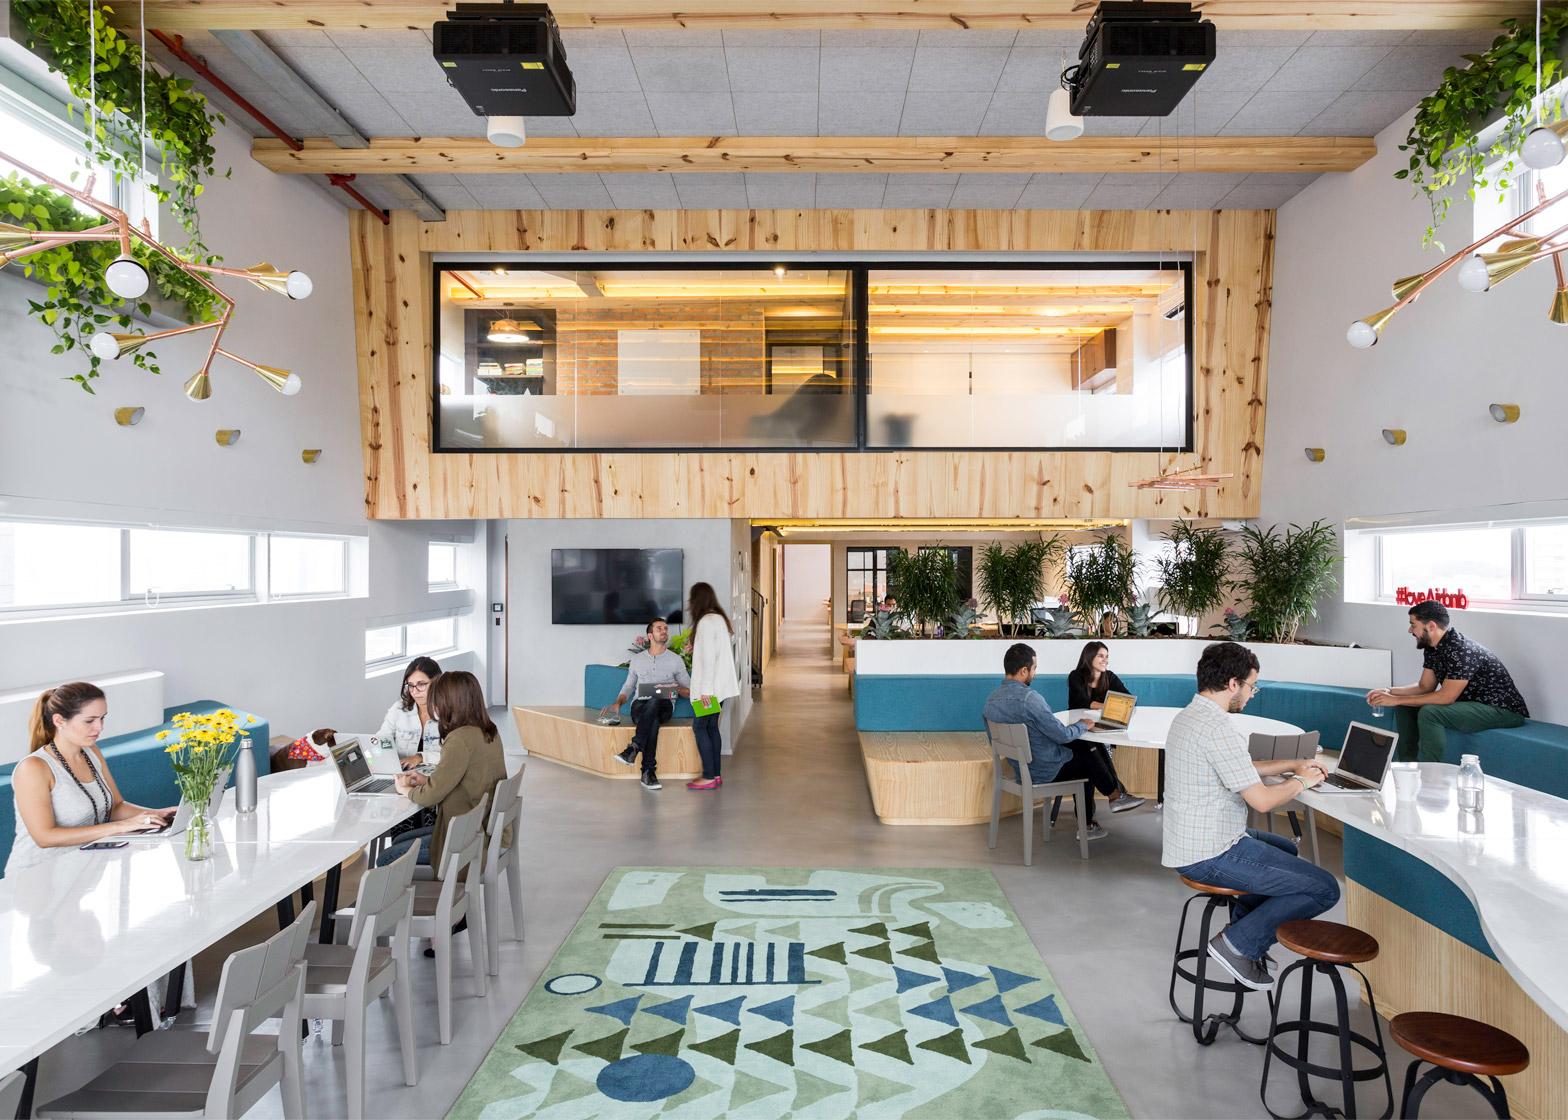 airbnb-offices_sao-paulo_mm18_dezeen_1568_7